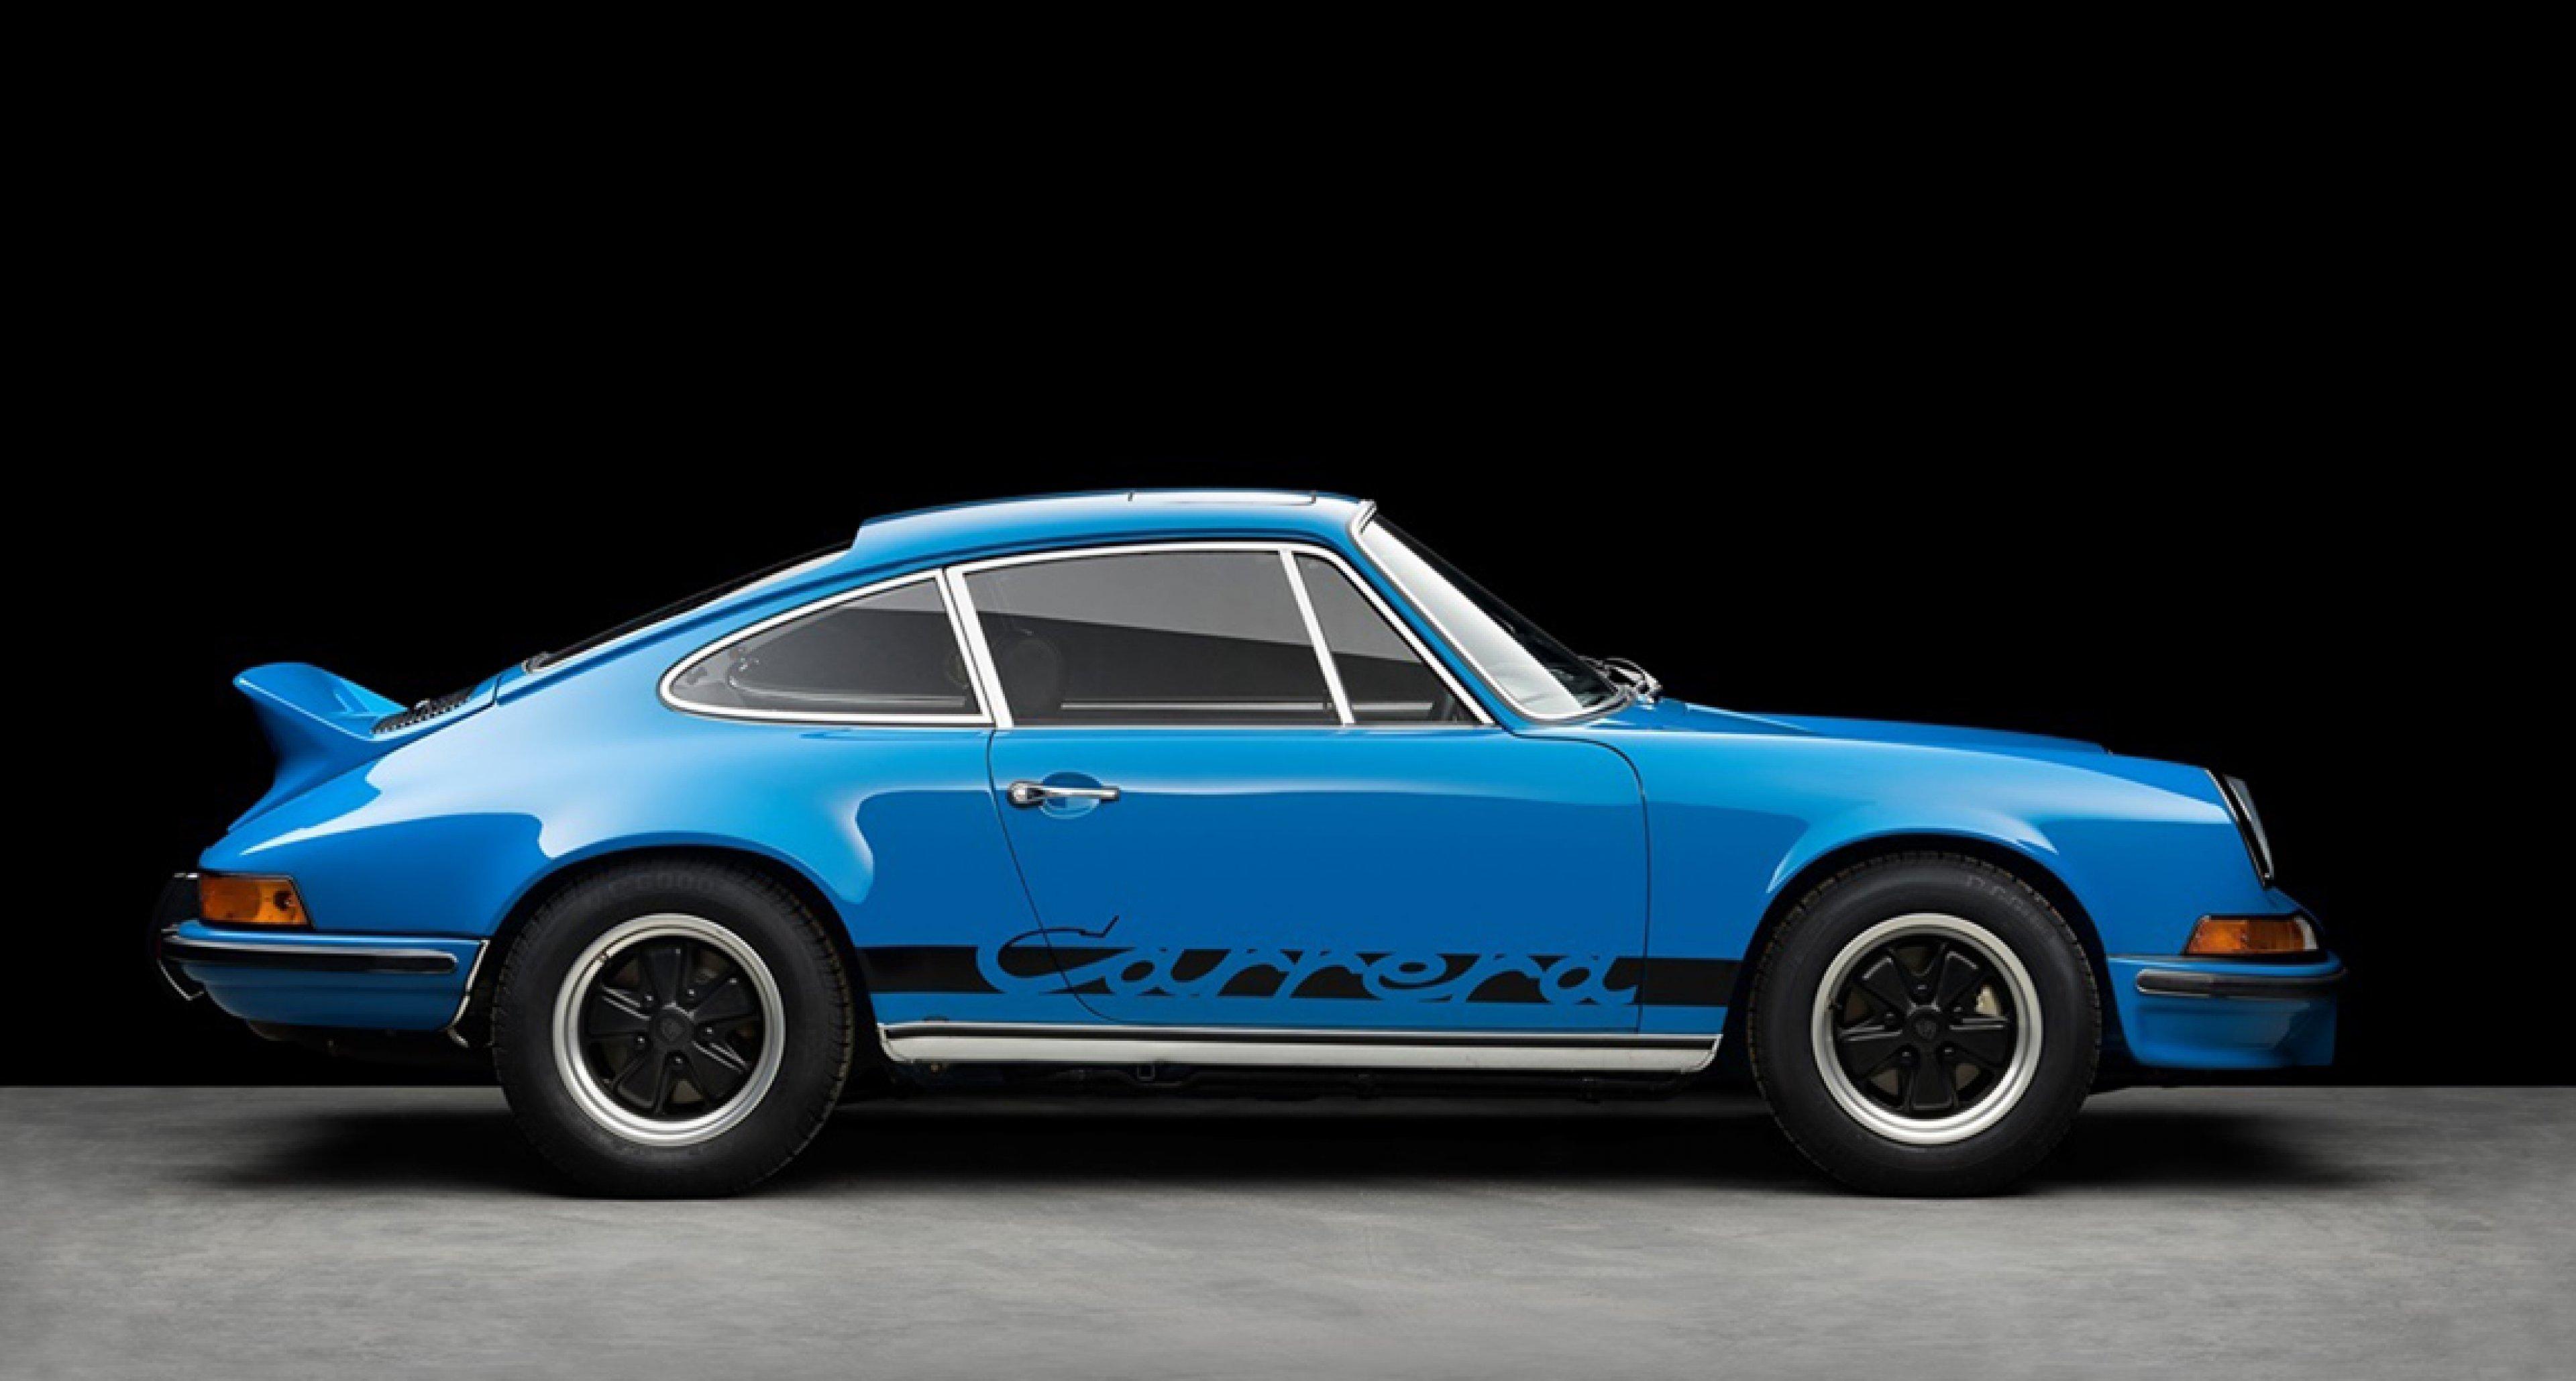 Porsche 911 Carrera RS 2.7 Blue